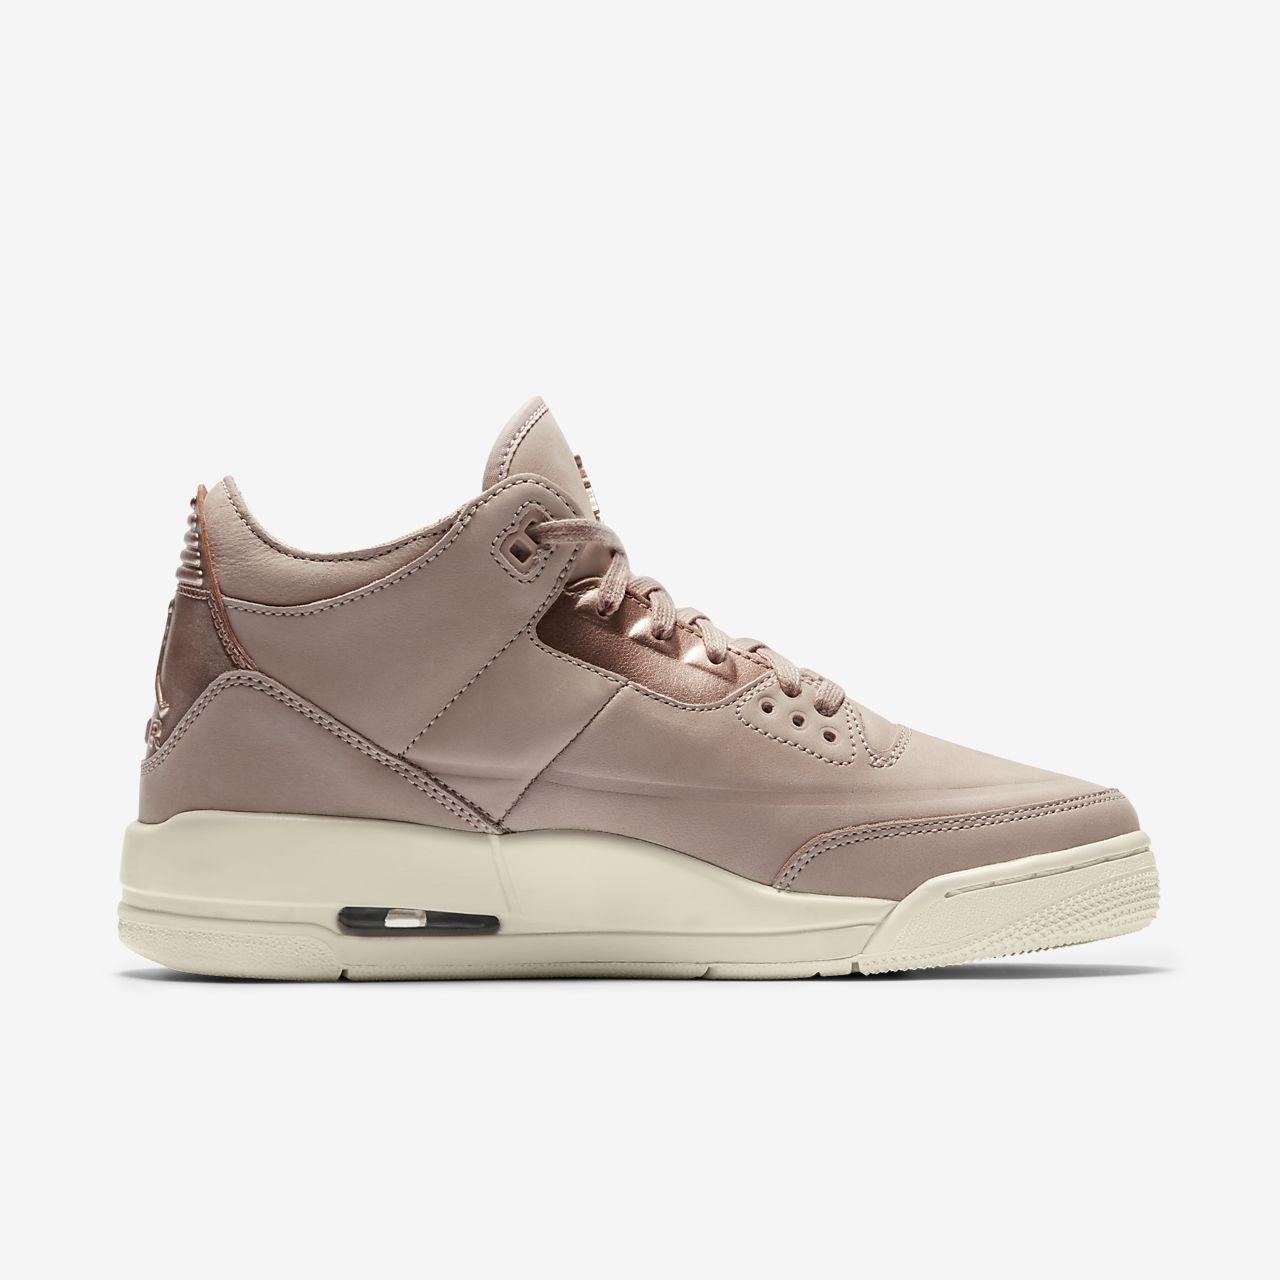 Air Jordan 3 Retro SE Women's Shoe